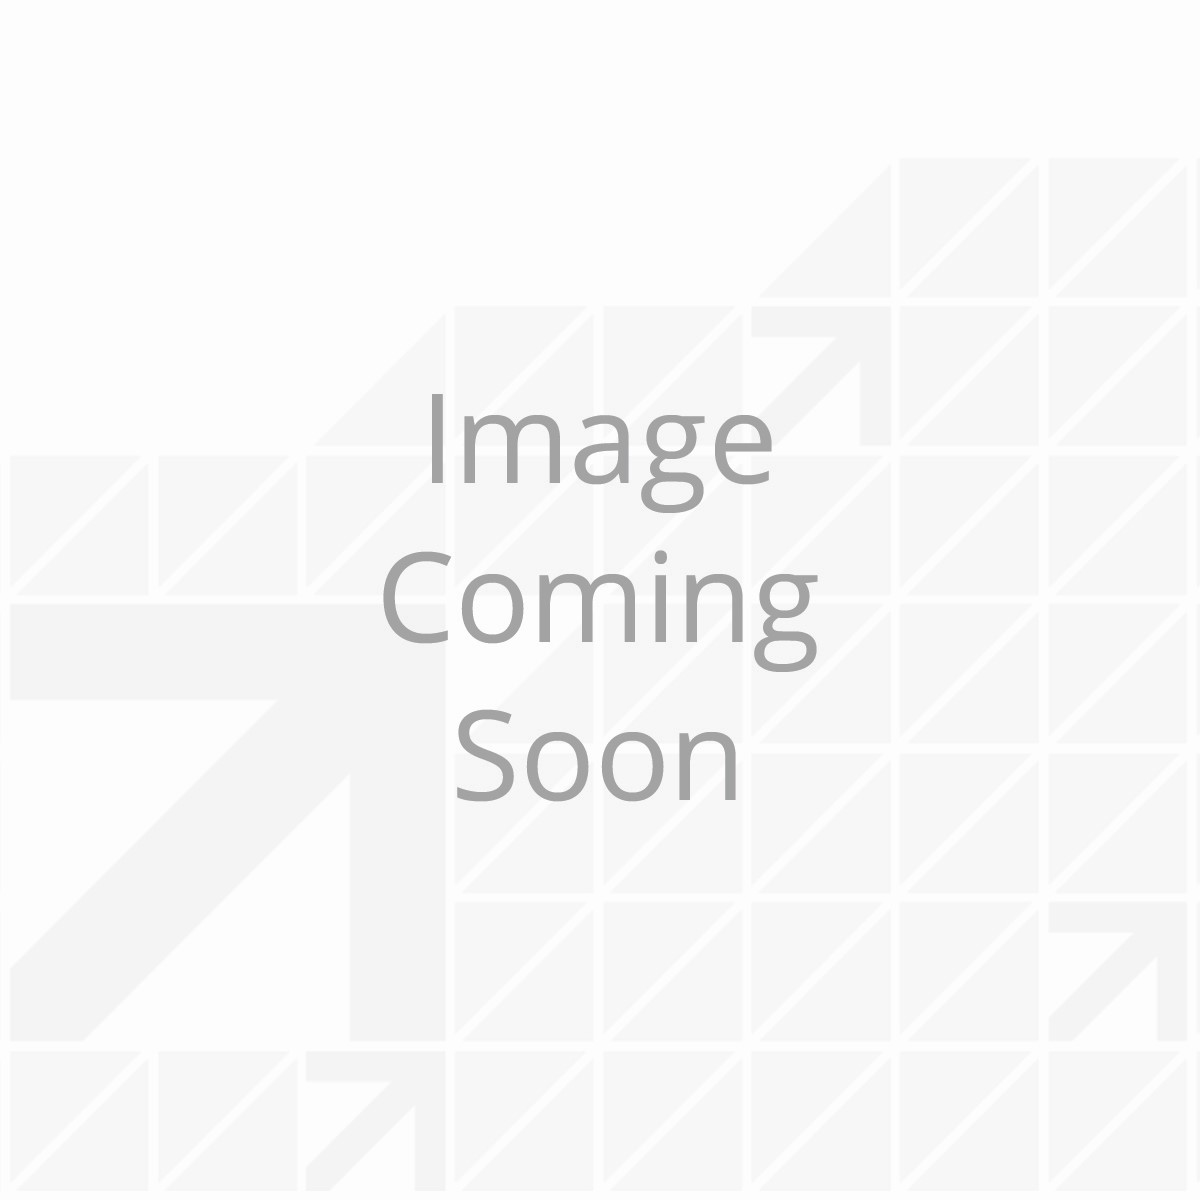 Door Insert Panel for 10 cu ft Refrigerator - Various Colors